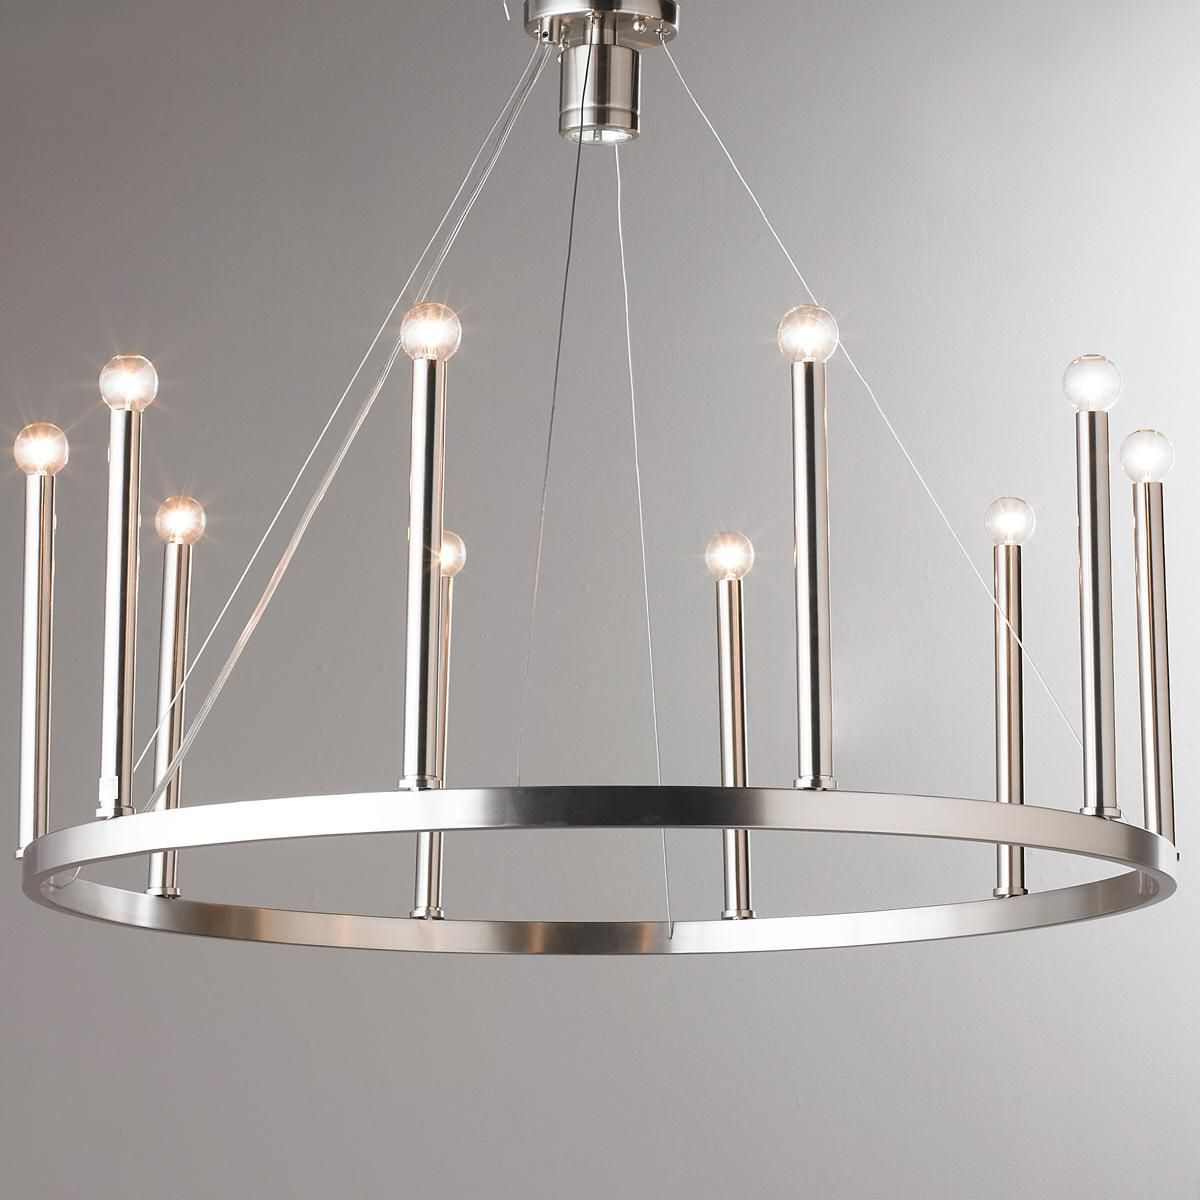 Euro Modern Candelabra Chandelier – 11 Light (View 16 of 25)